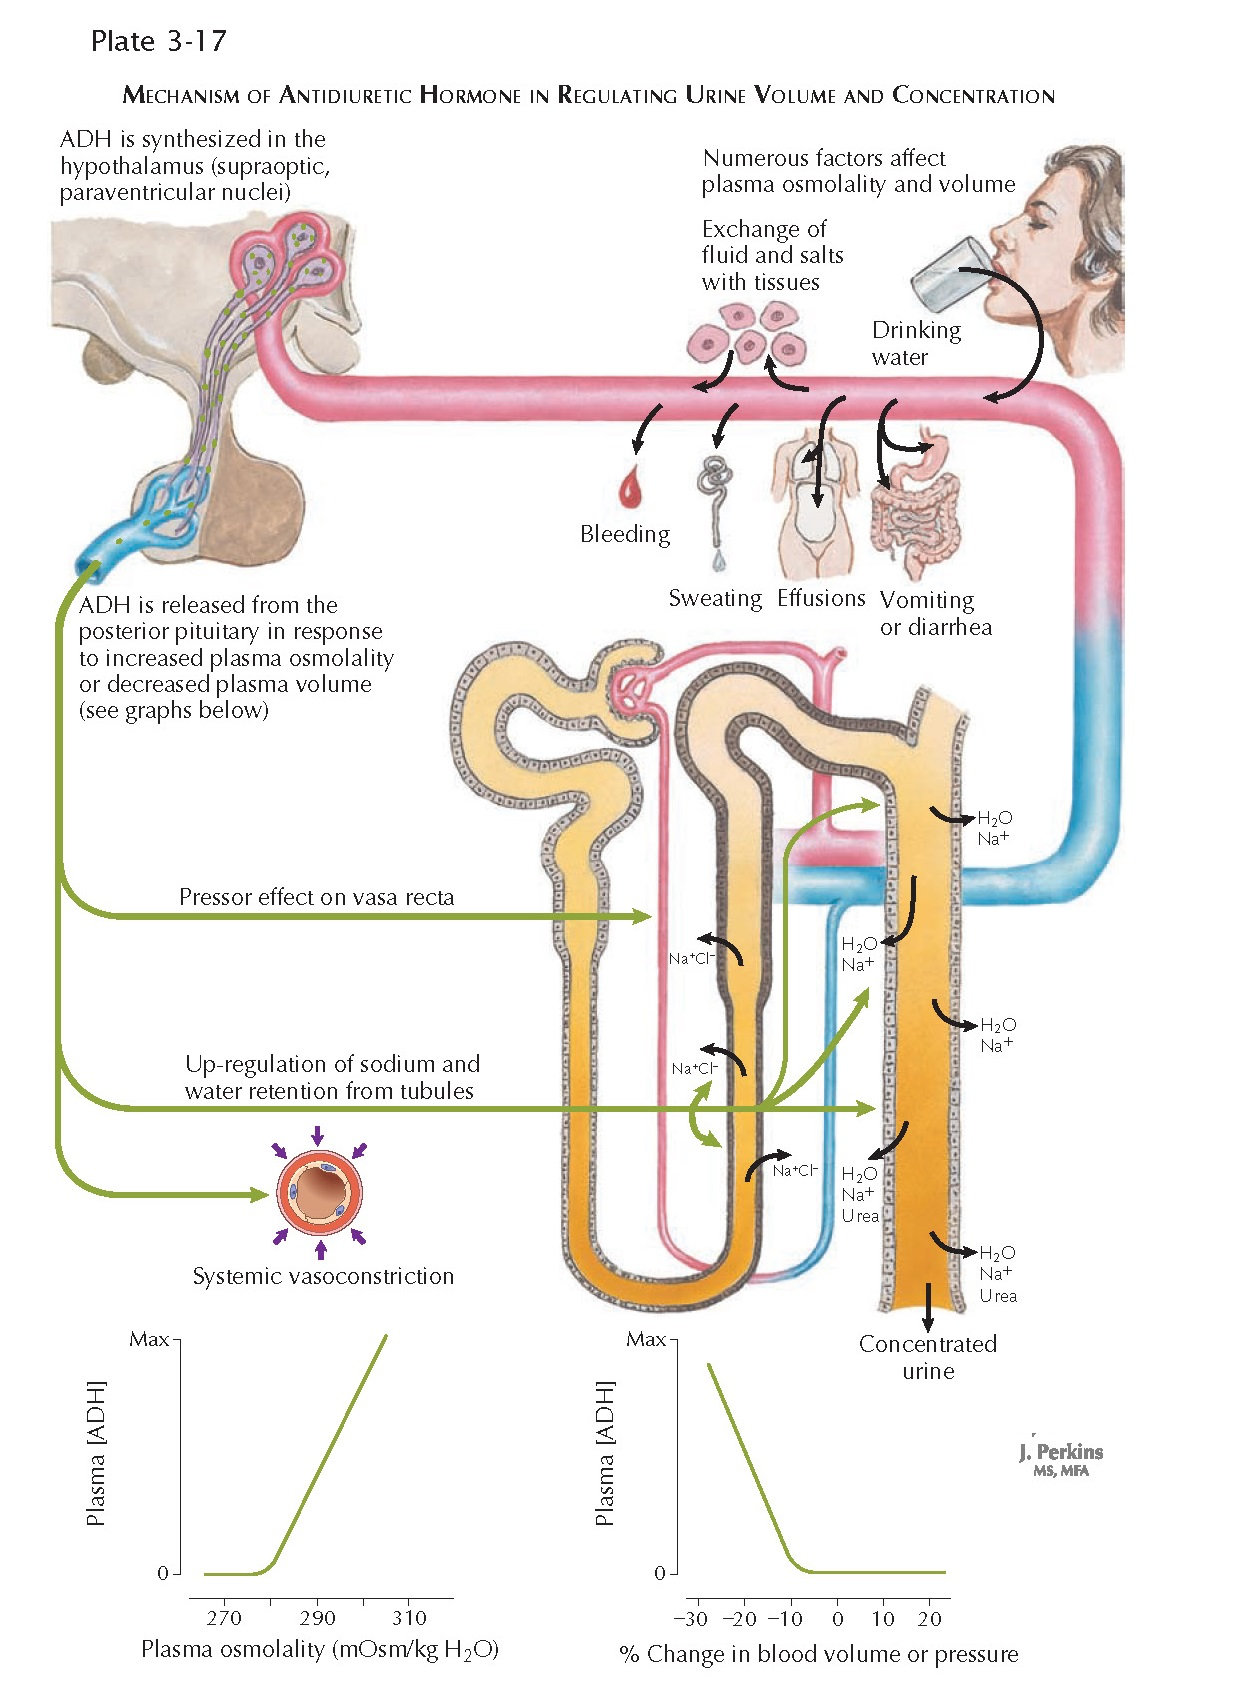 MECHANISM OF ANTIDIURETIC HORMONE IN REGULATING URINE VOLUME AND CONCENTRATION